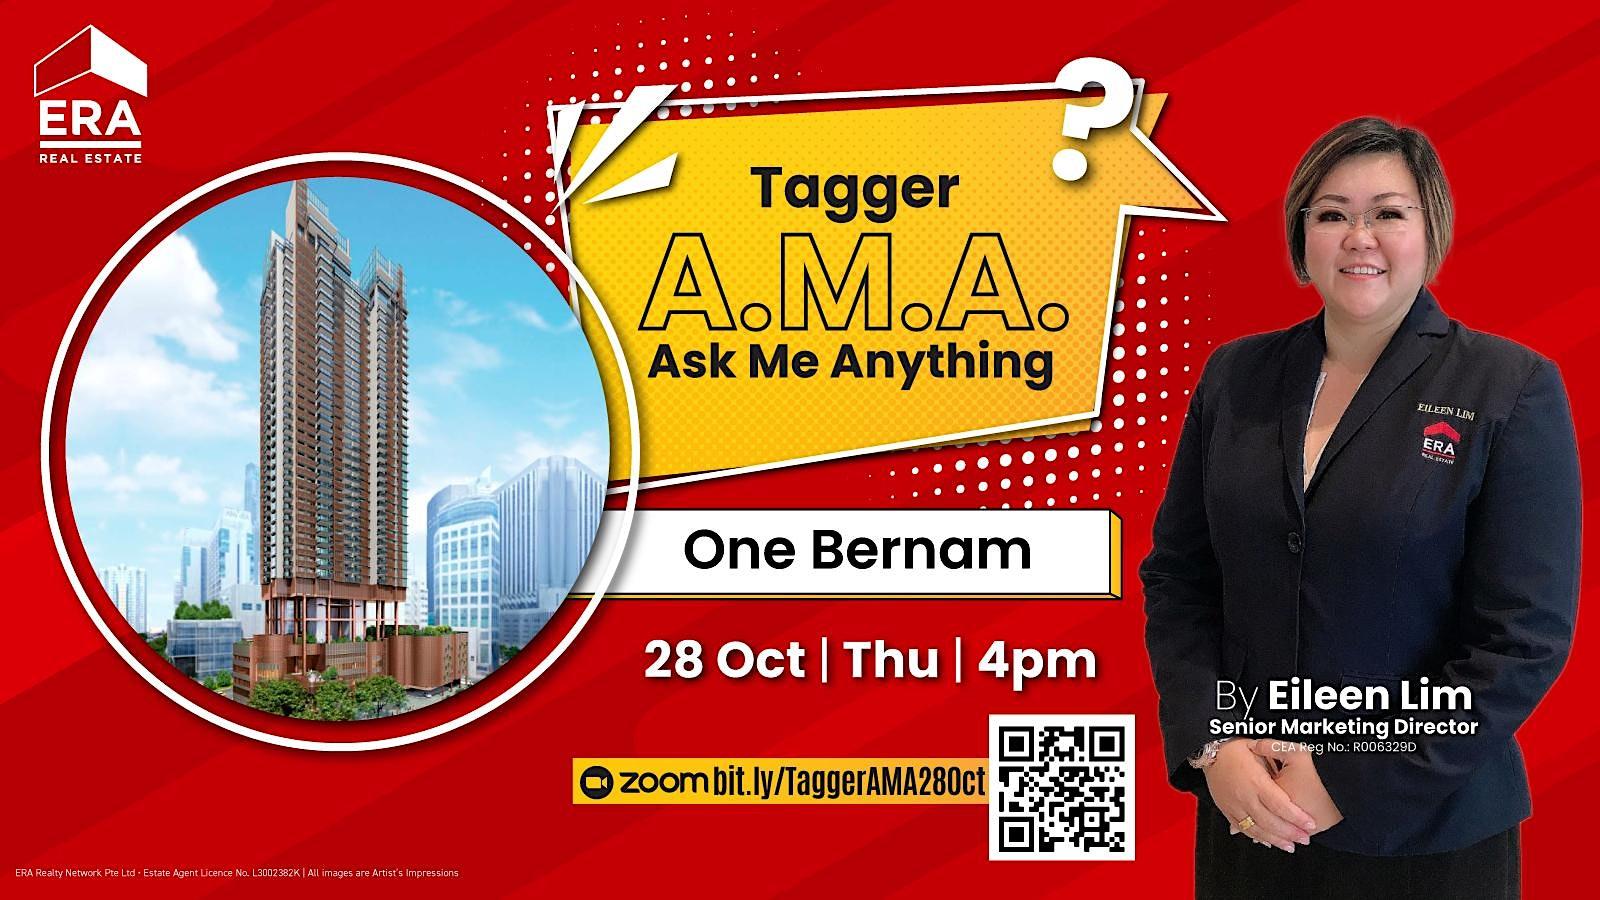 Tagger A.M.A (One Bernam)